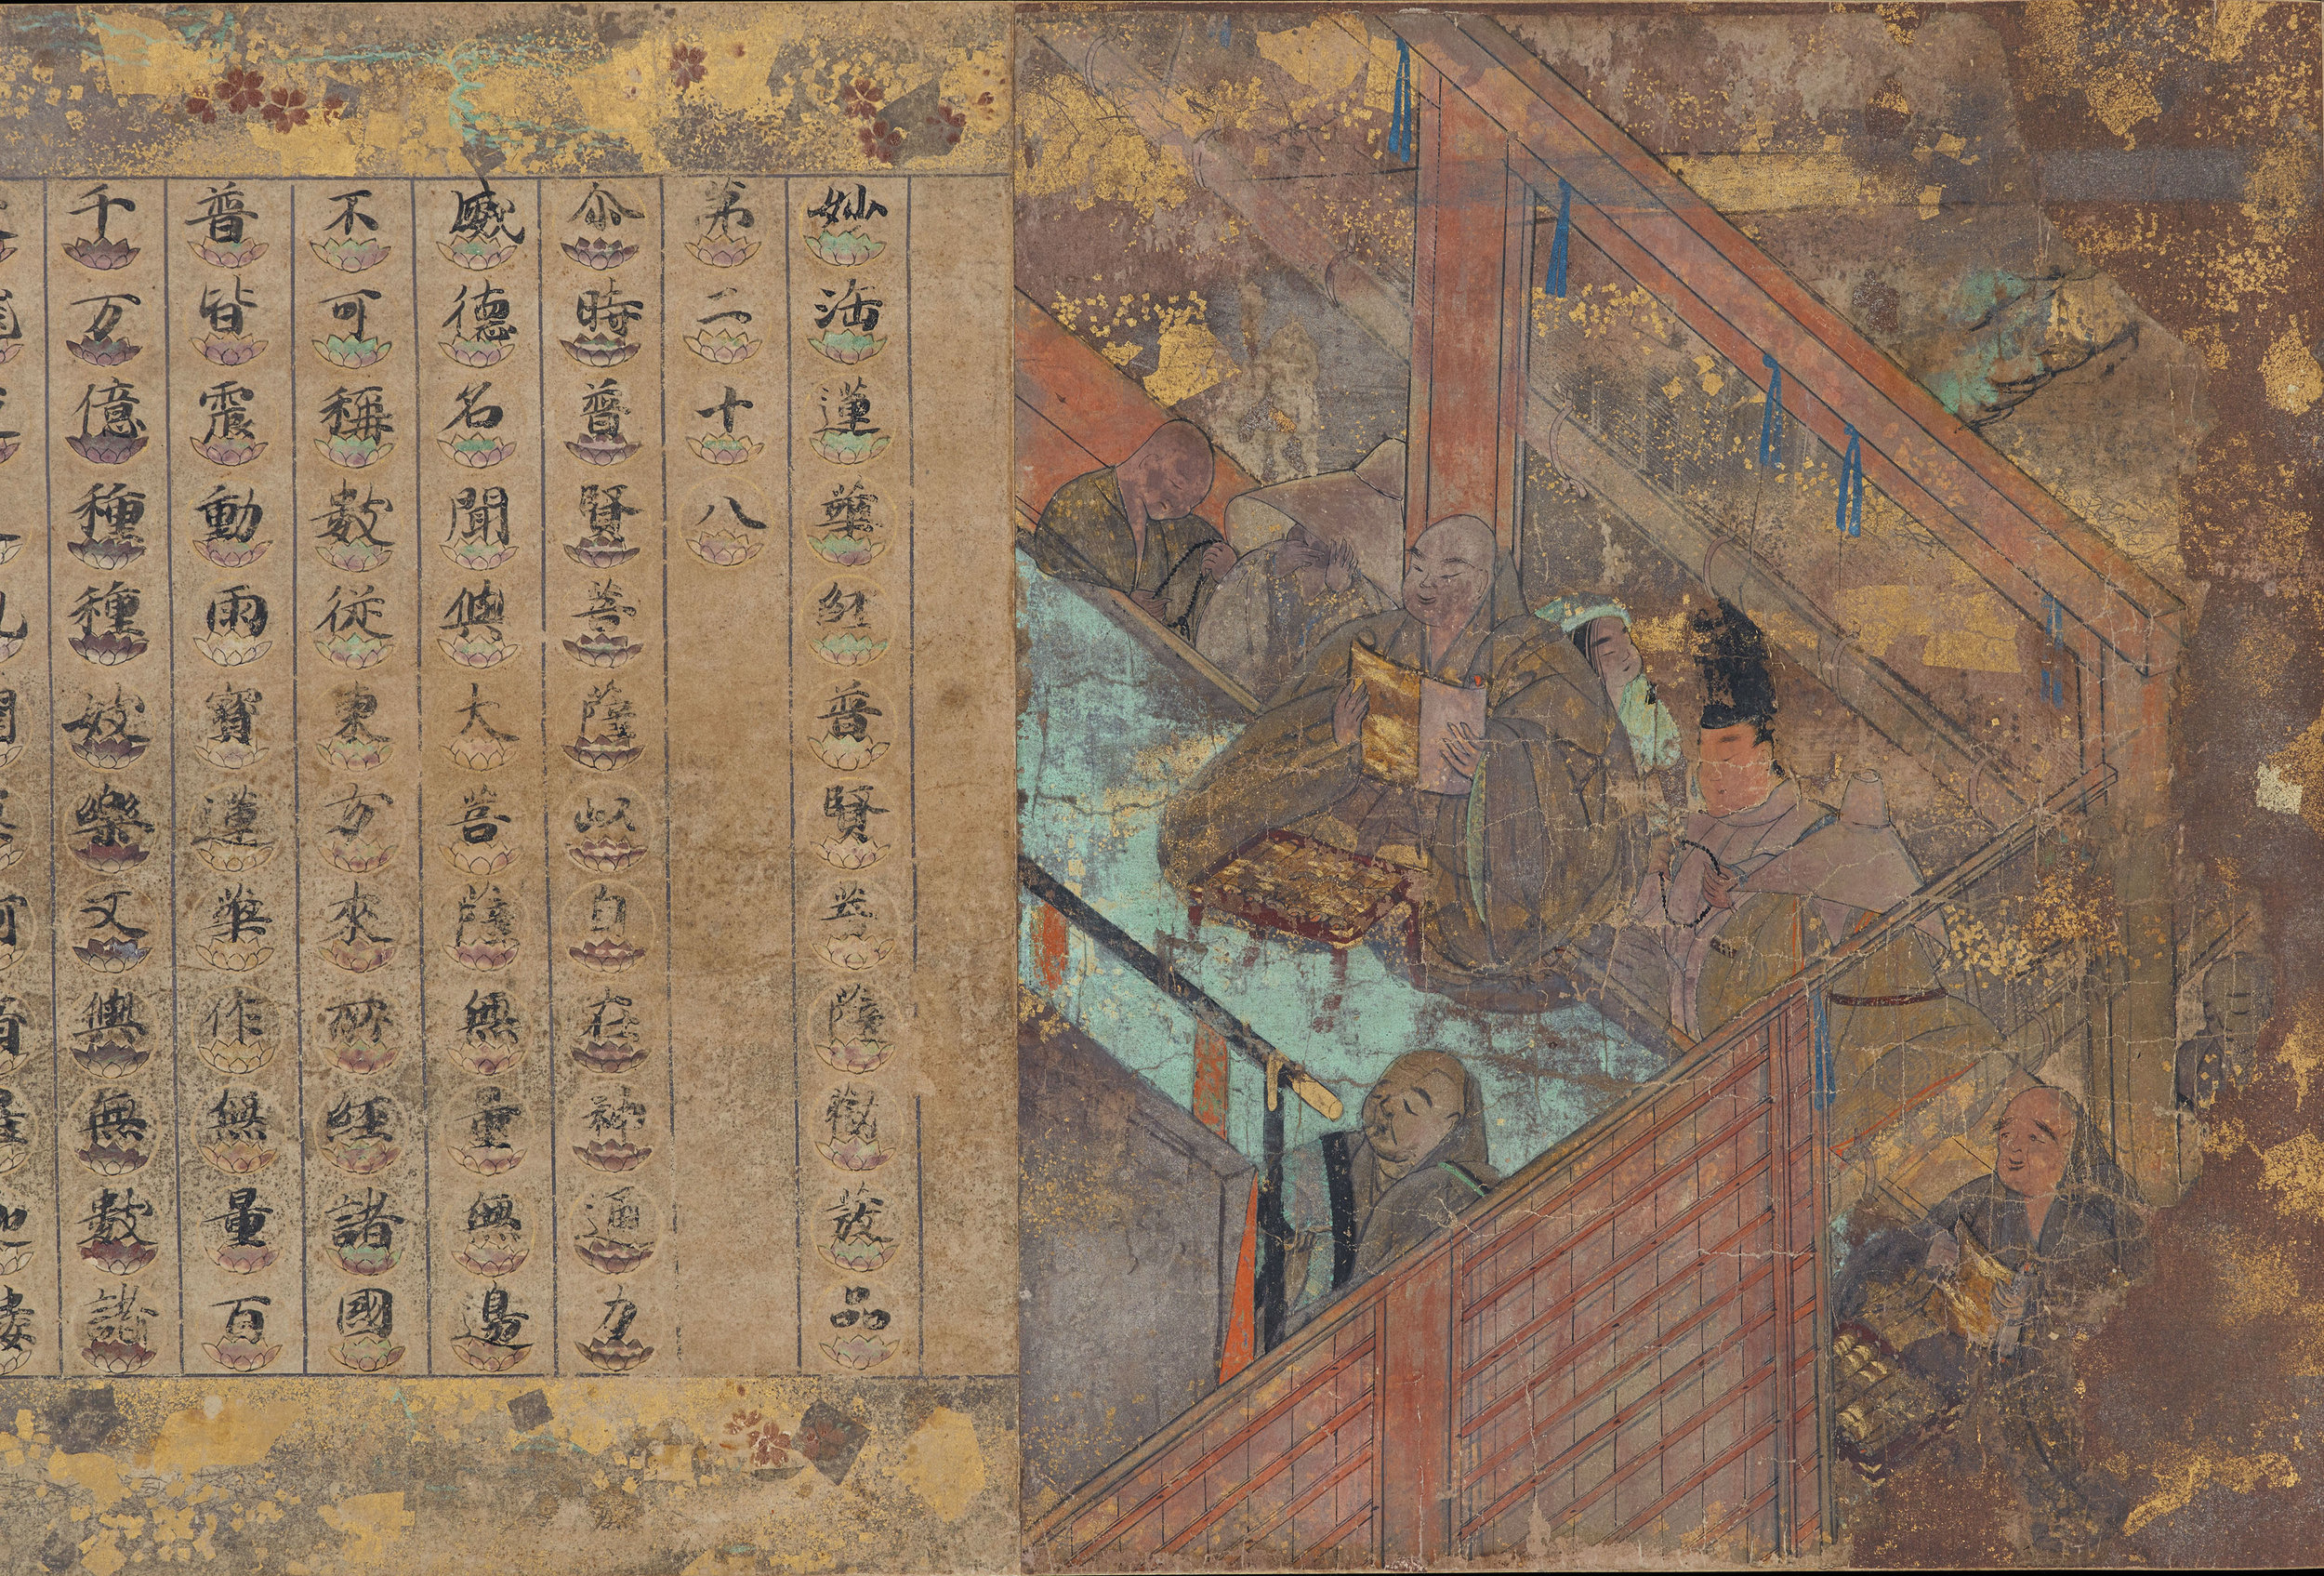 蓮華法華経<普賢菩薩勧発貧> Unidentified Artist Ichiji reandai Hokekyō, Fugen Bosatsu kanbotsuhon Japan, late Heian period (794– 1185), 12th century Handscroll; ink, color, and gold on paper